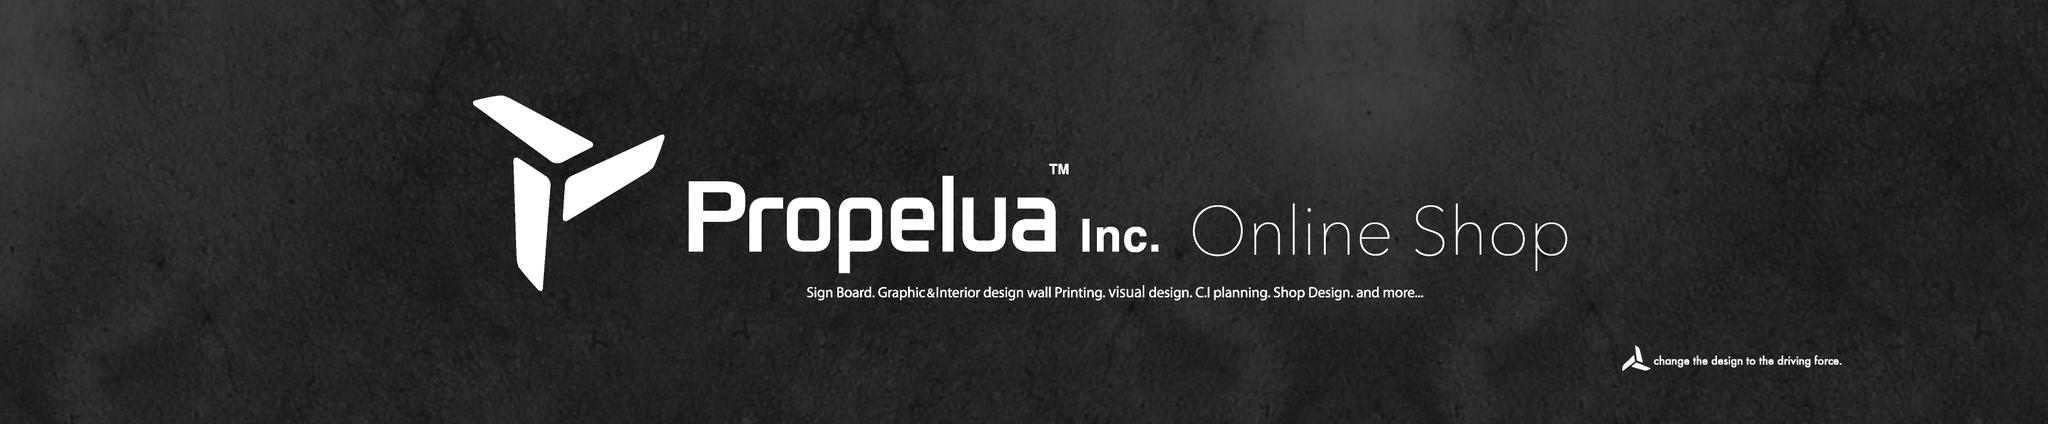 Propelua Inc. * プロペラ